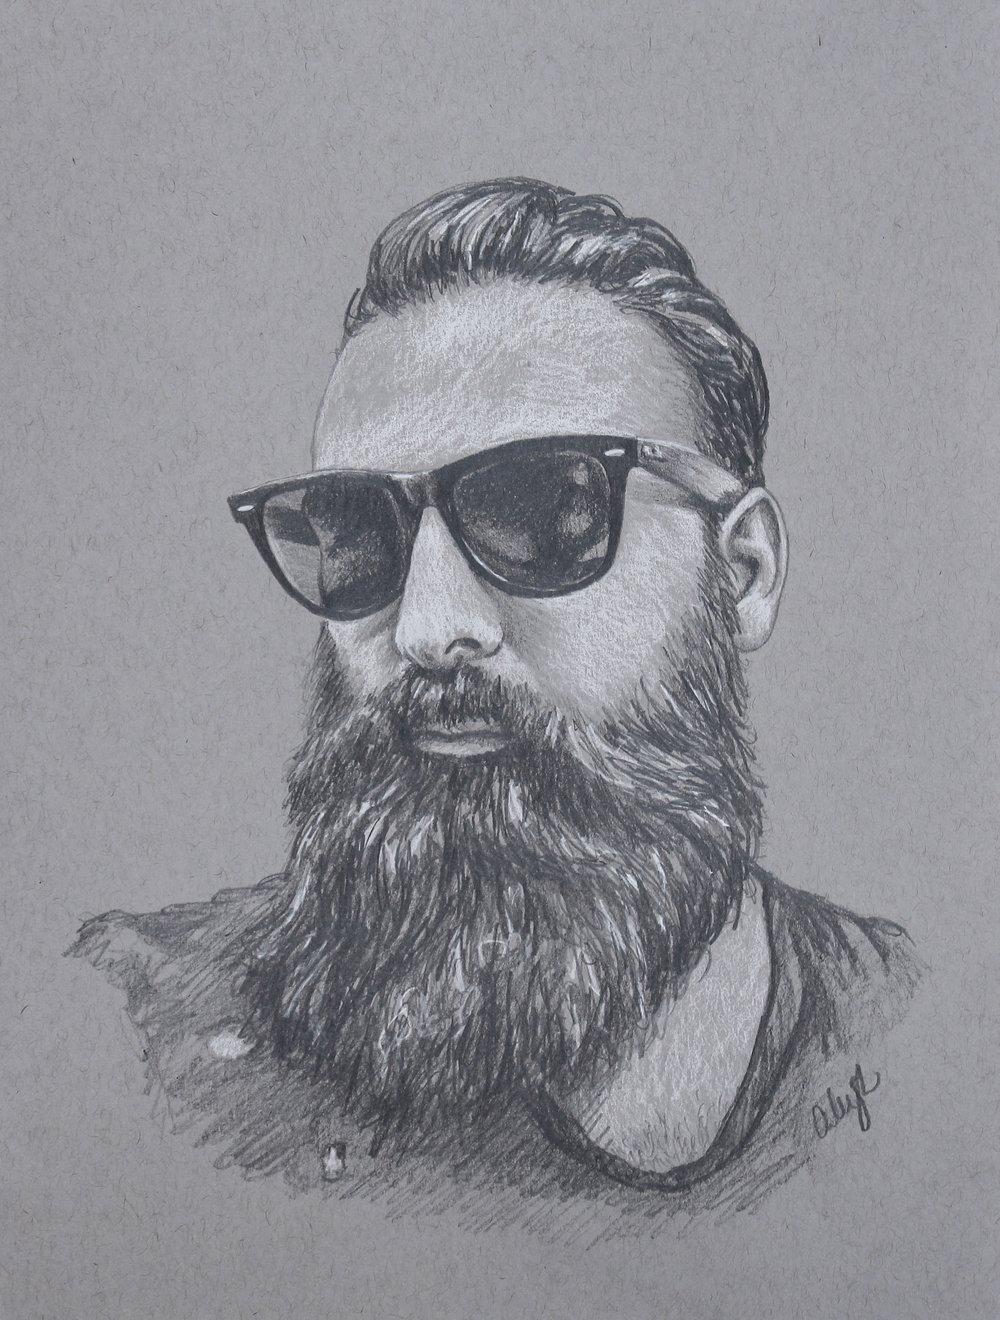 pencil portrait demo